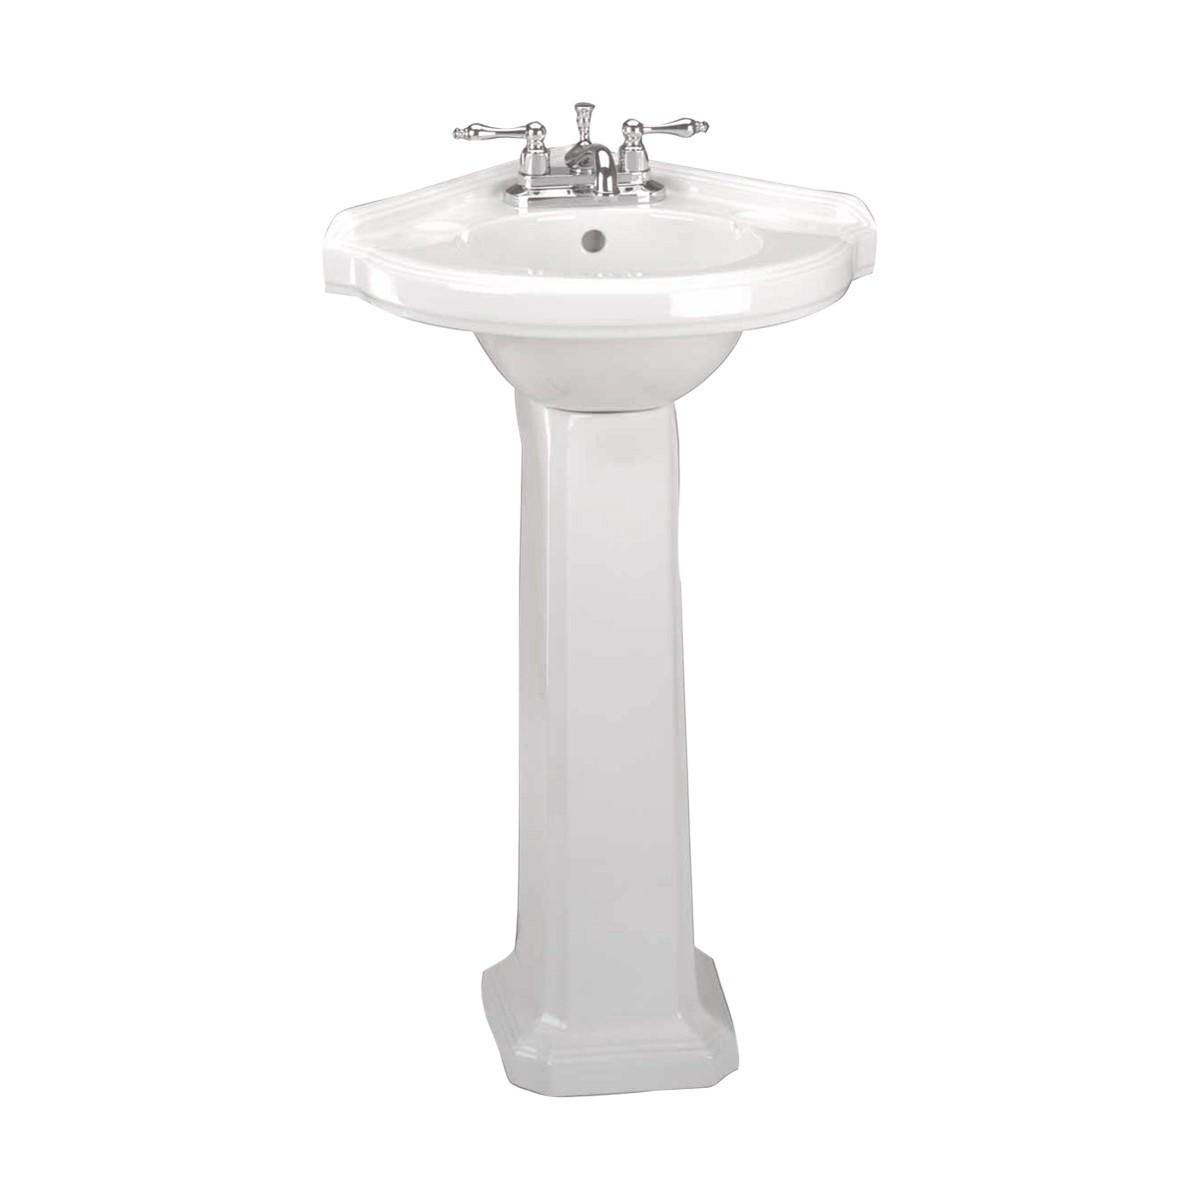 modern a pedestal kohler to homes sink install incredible